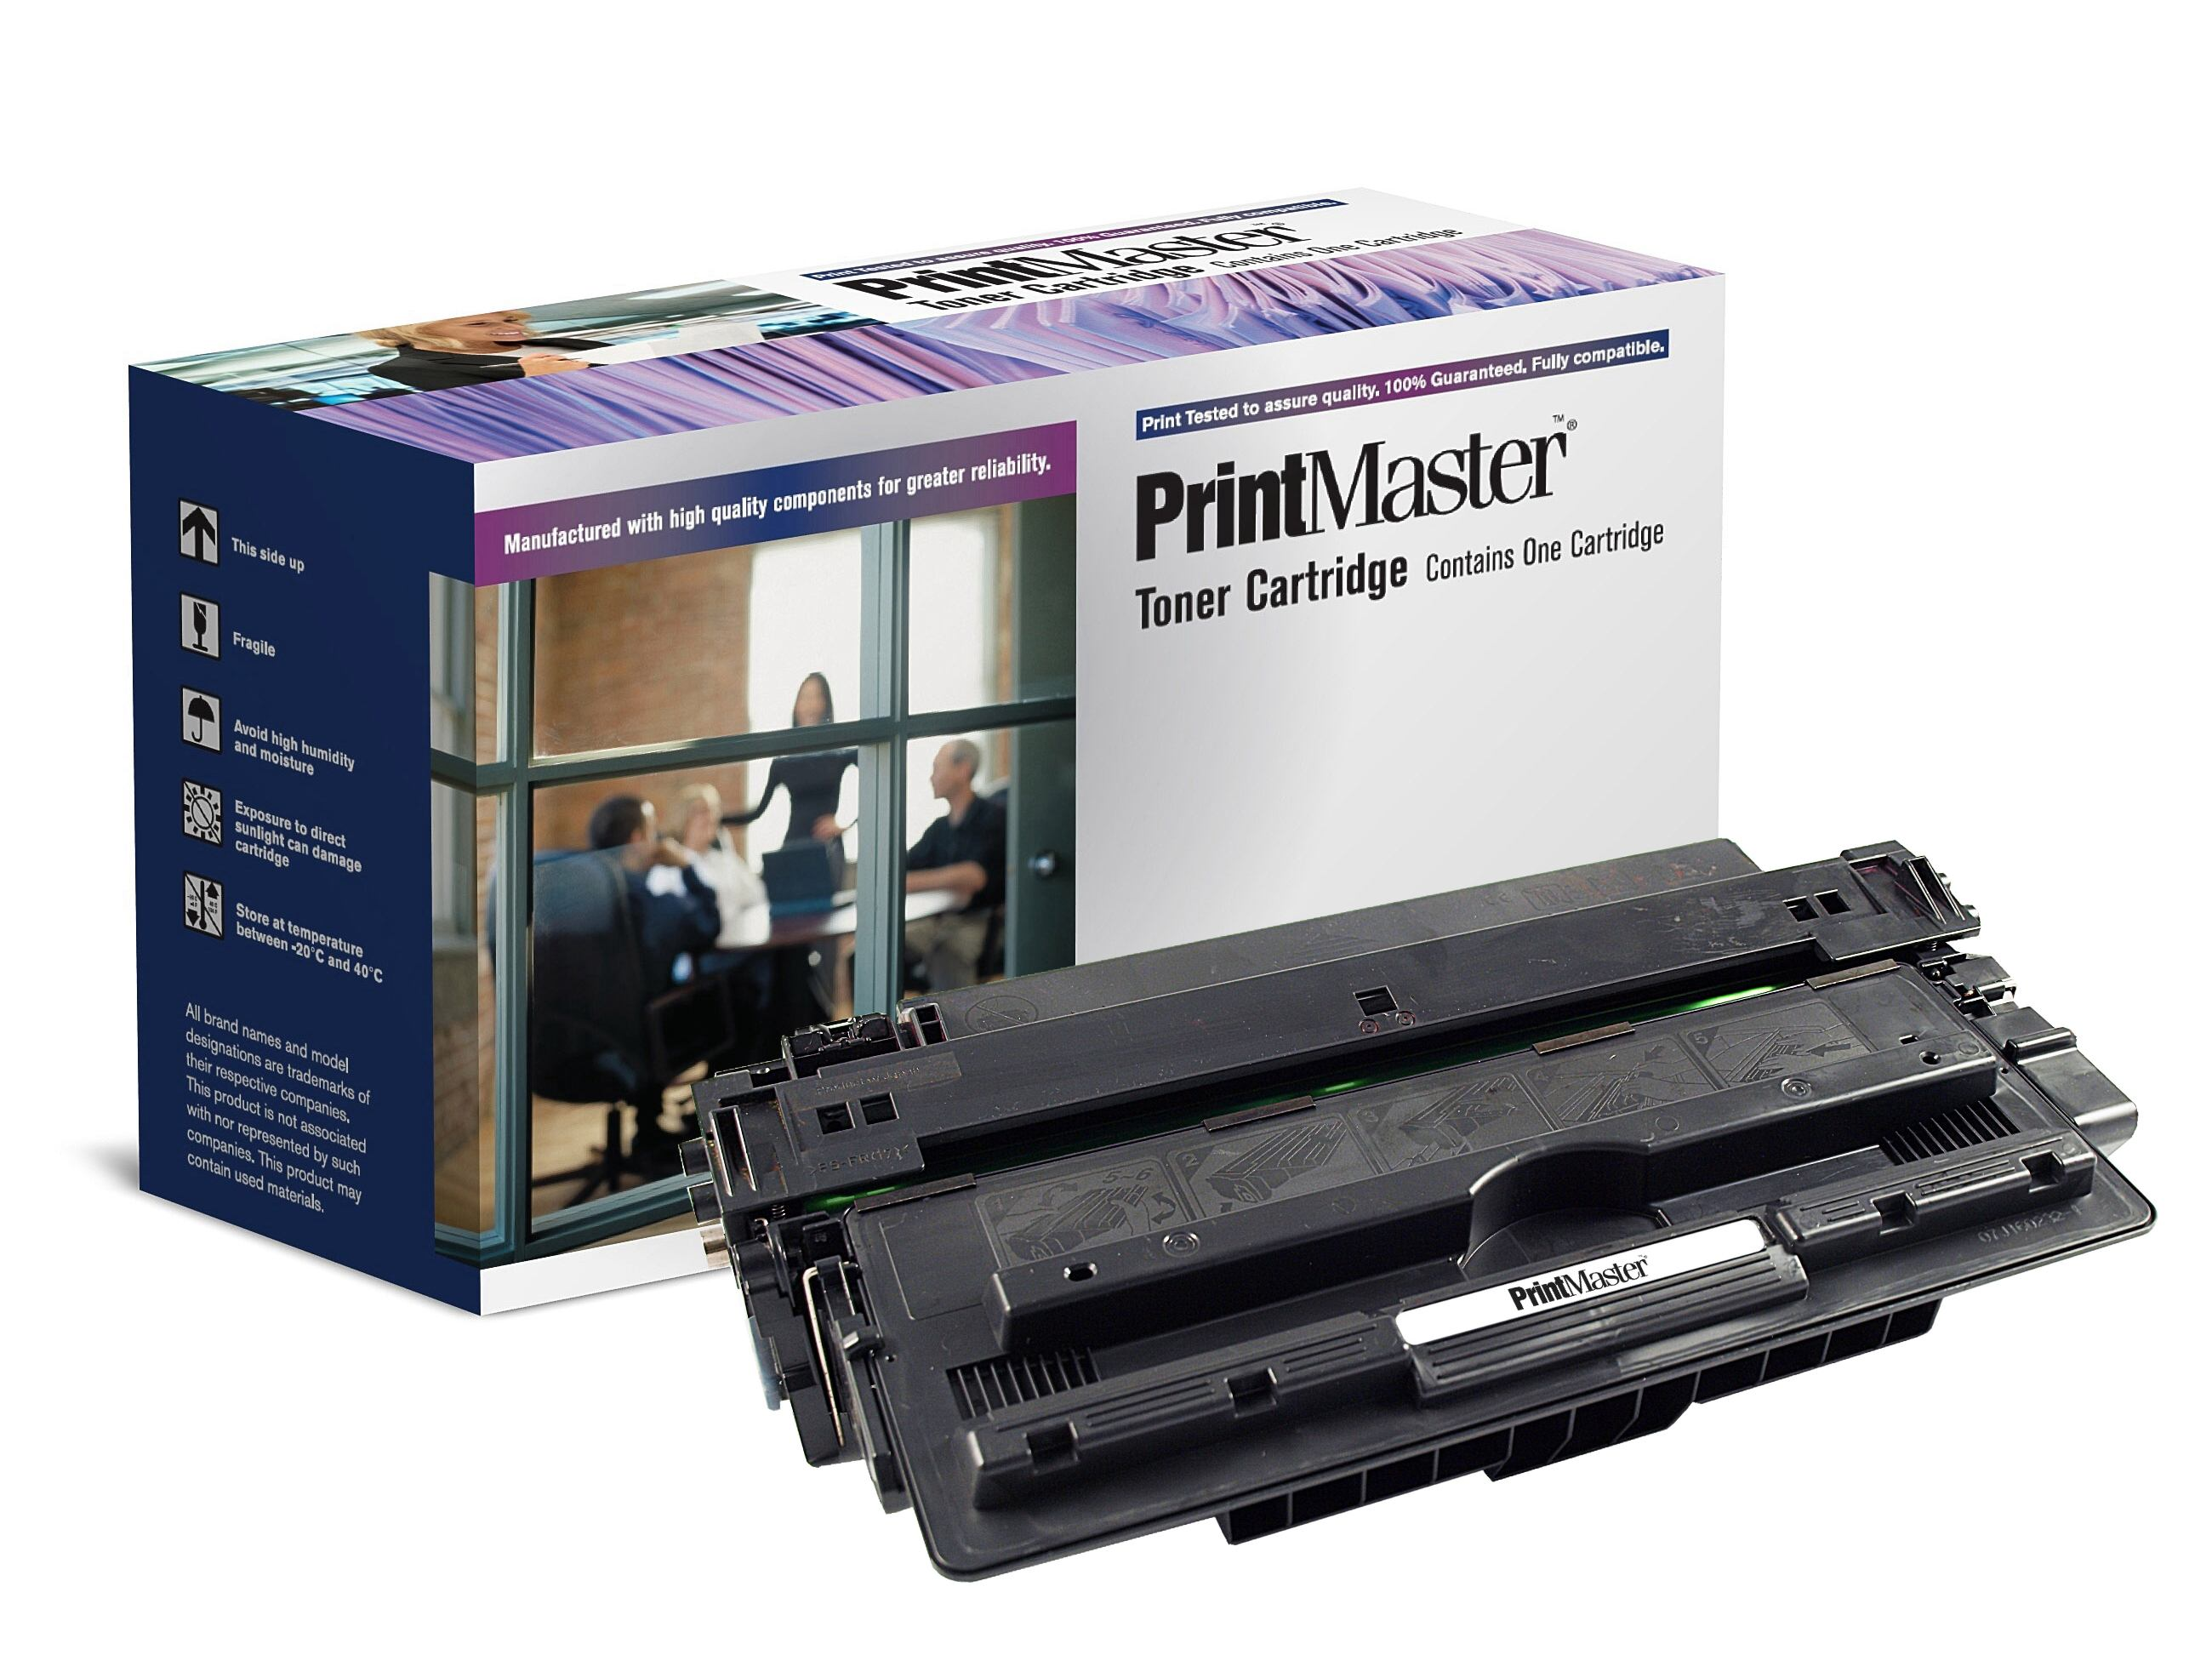 PrintMaster HP LJ5200 Black Toner 12K